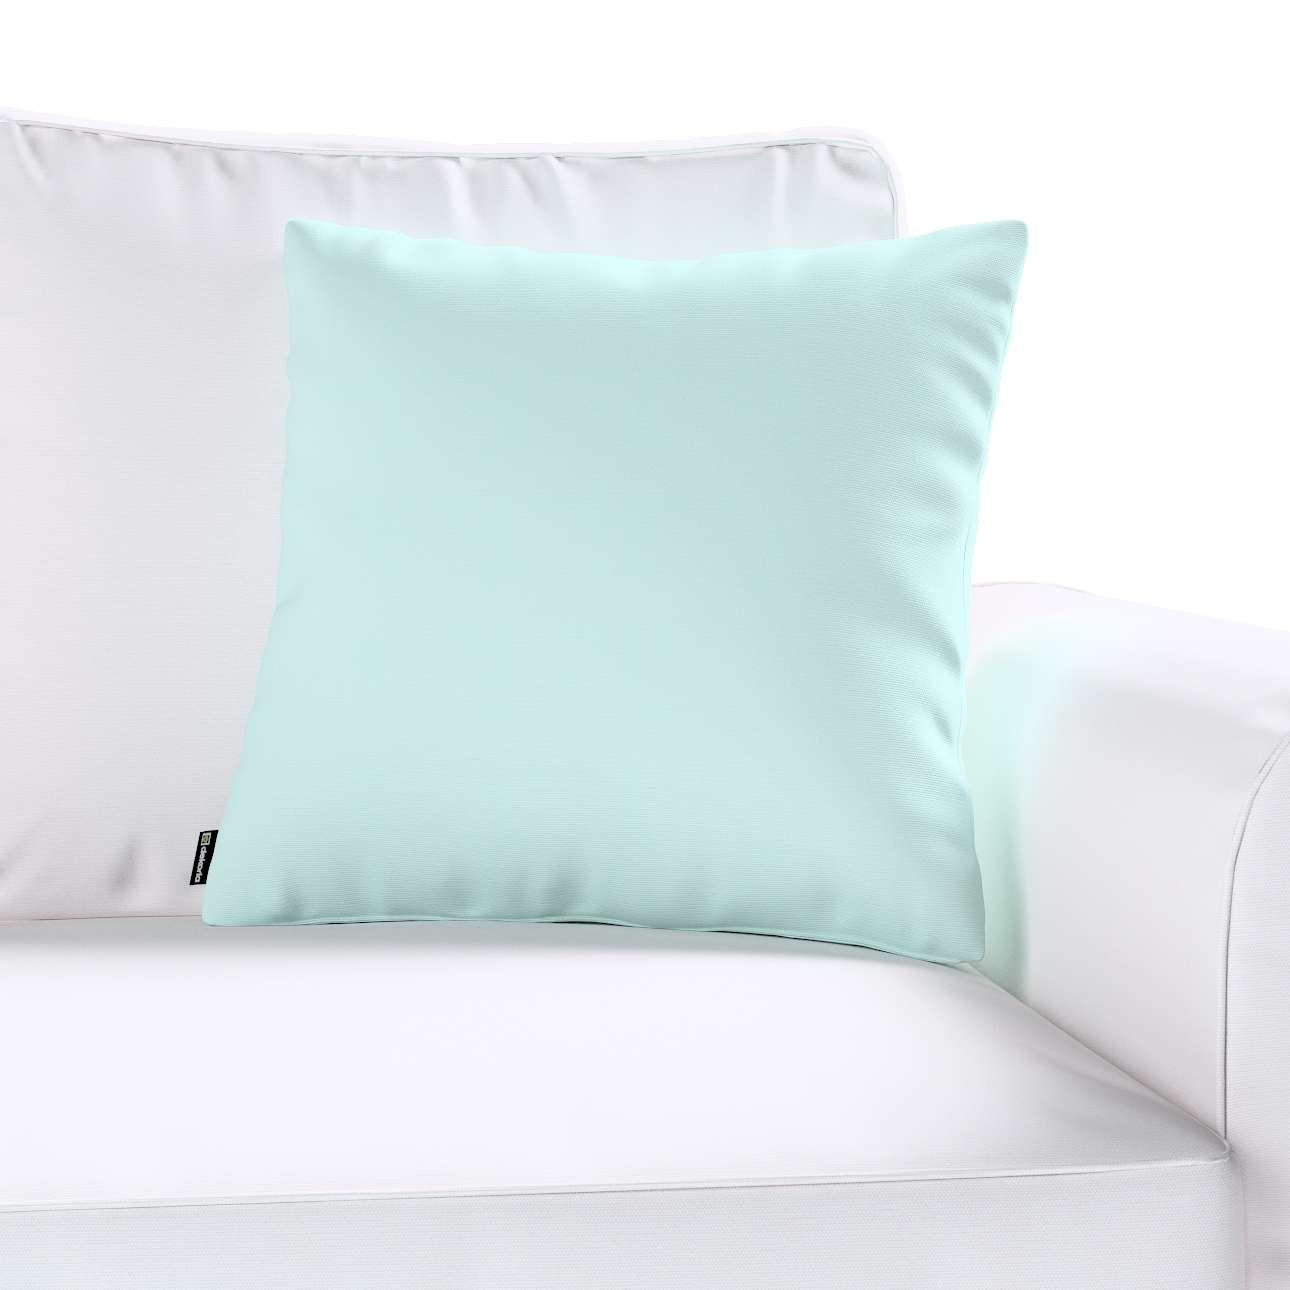 Kissenhülle Kinga von der Kollektion Cotton Panama, Stoff: 702-10